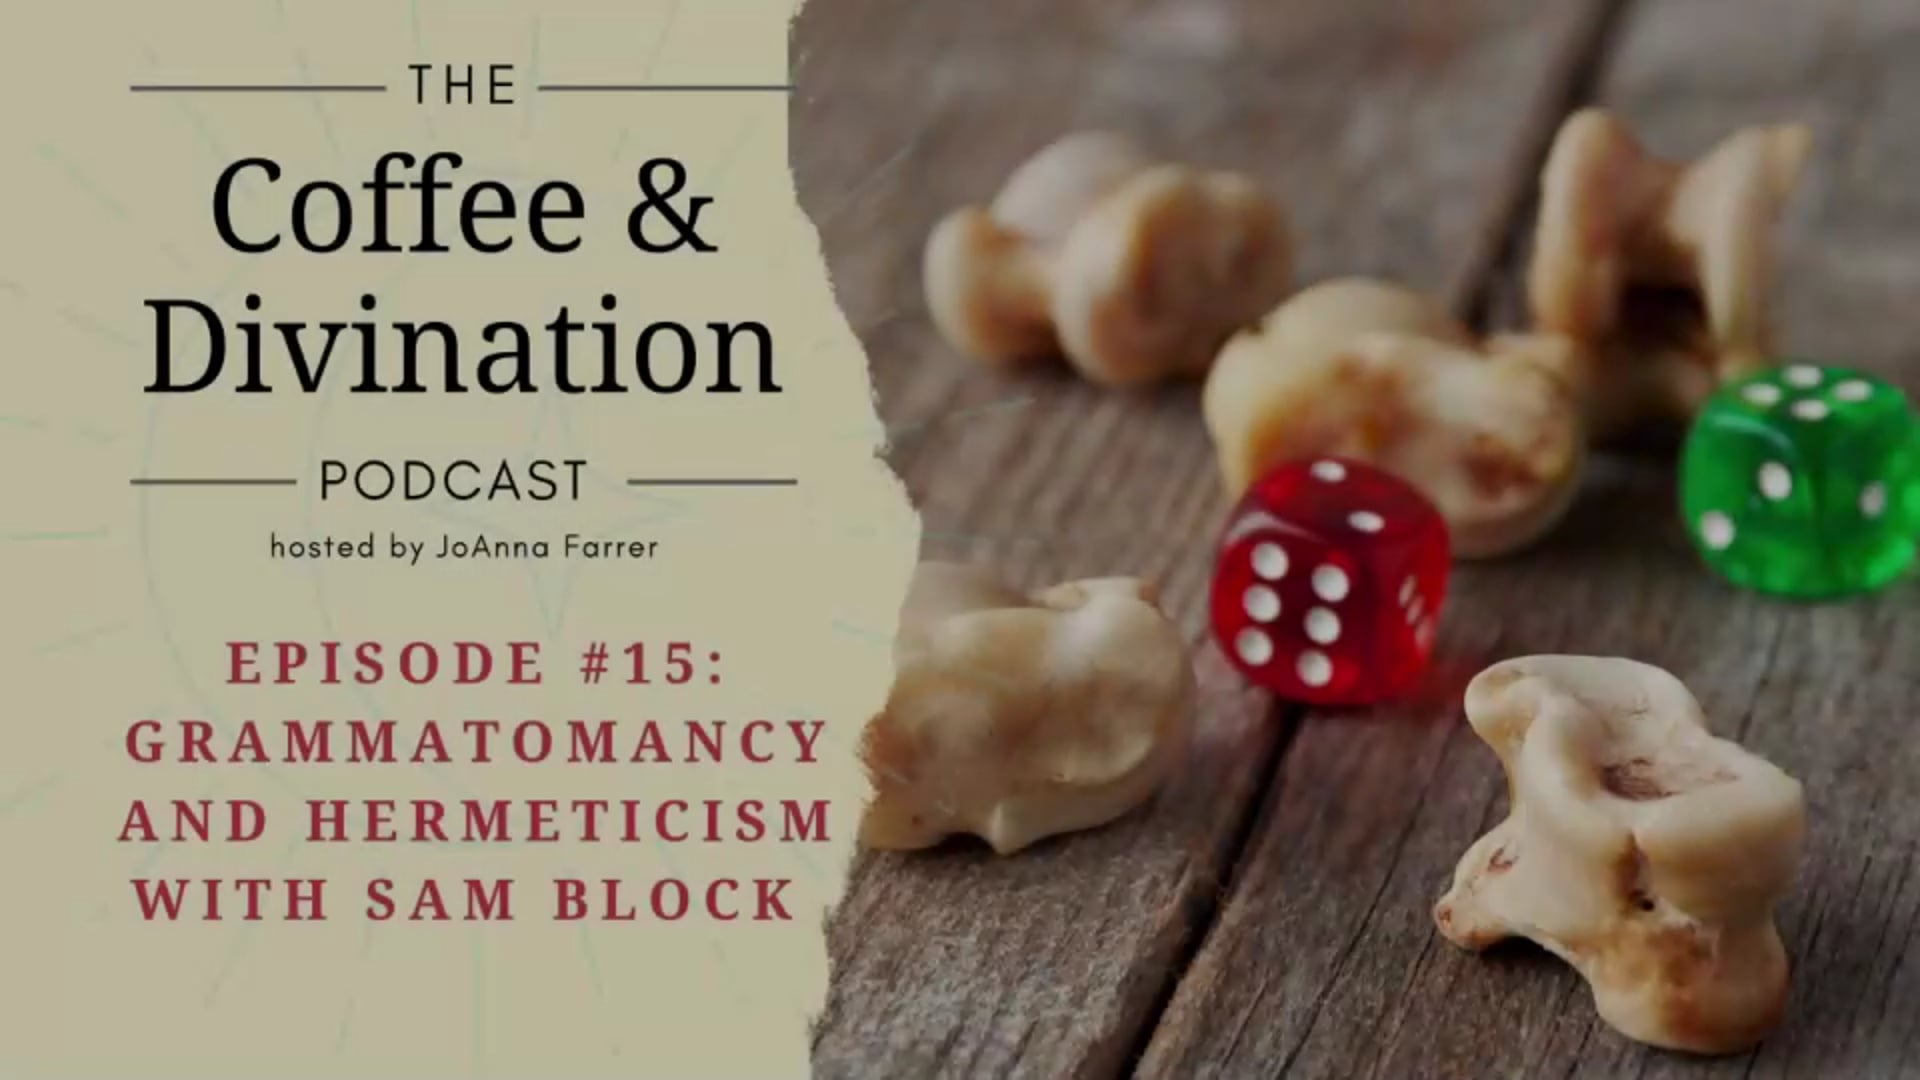 Coffee & Divination - Episode #15: Grammatomancy and Hermeticism with Sam Block